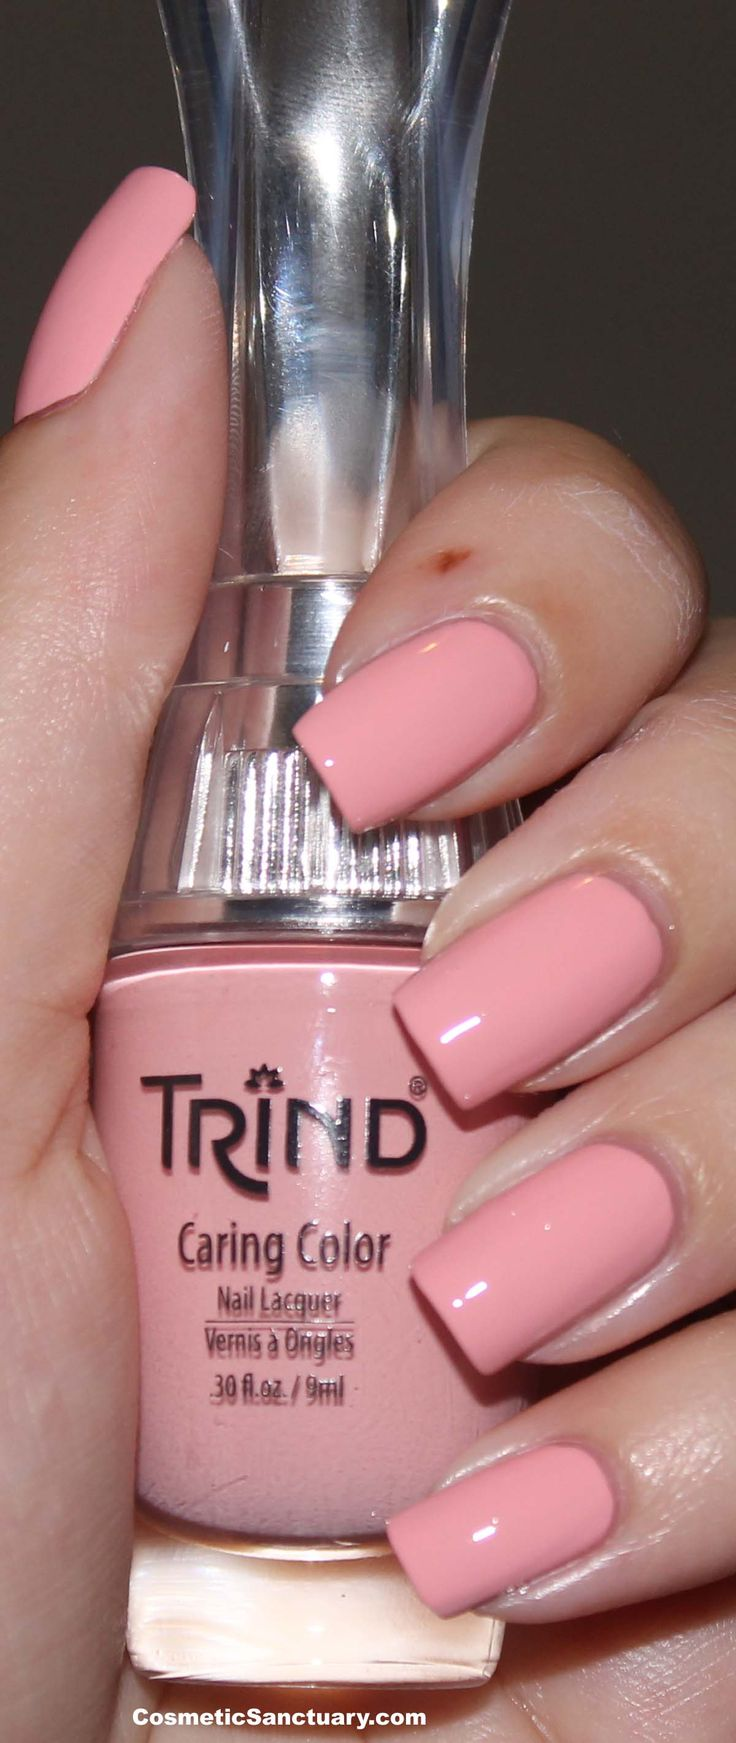 Trind Pastel Peach- An in store favorite! Vooral verkrijgbaar bij schoonheidssalons en drogisterij dio Anne in Bussum weet je er alles over te vertellen